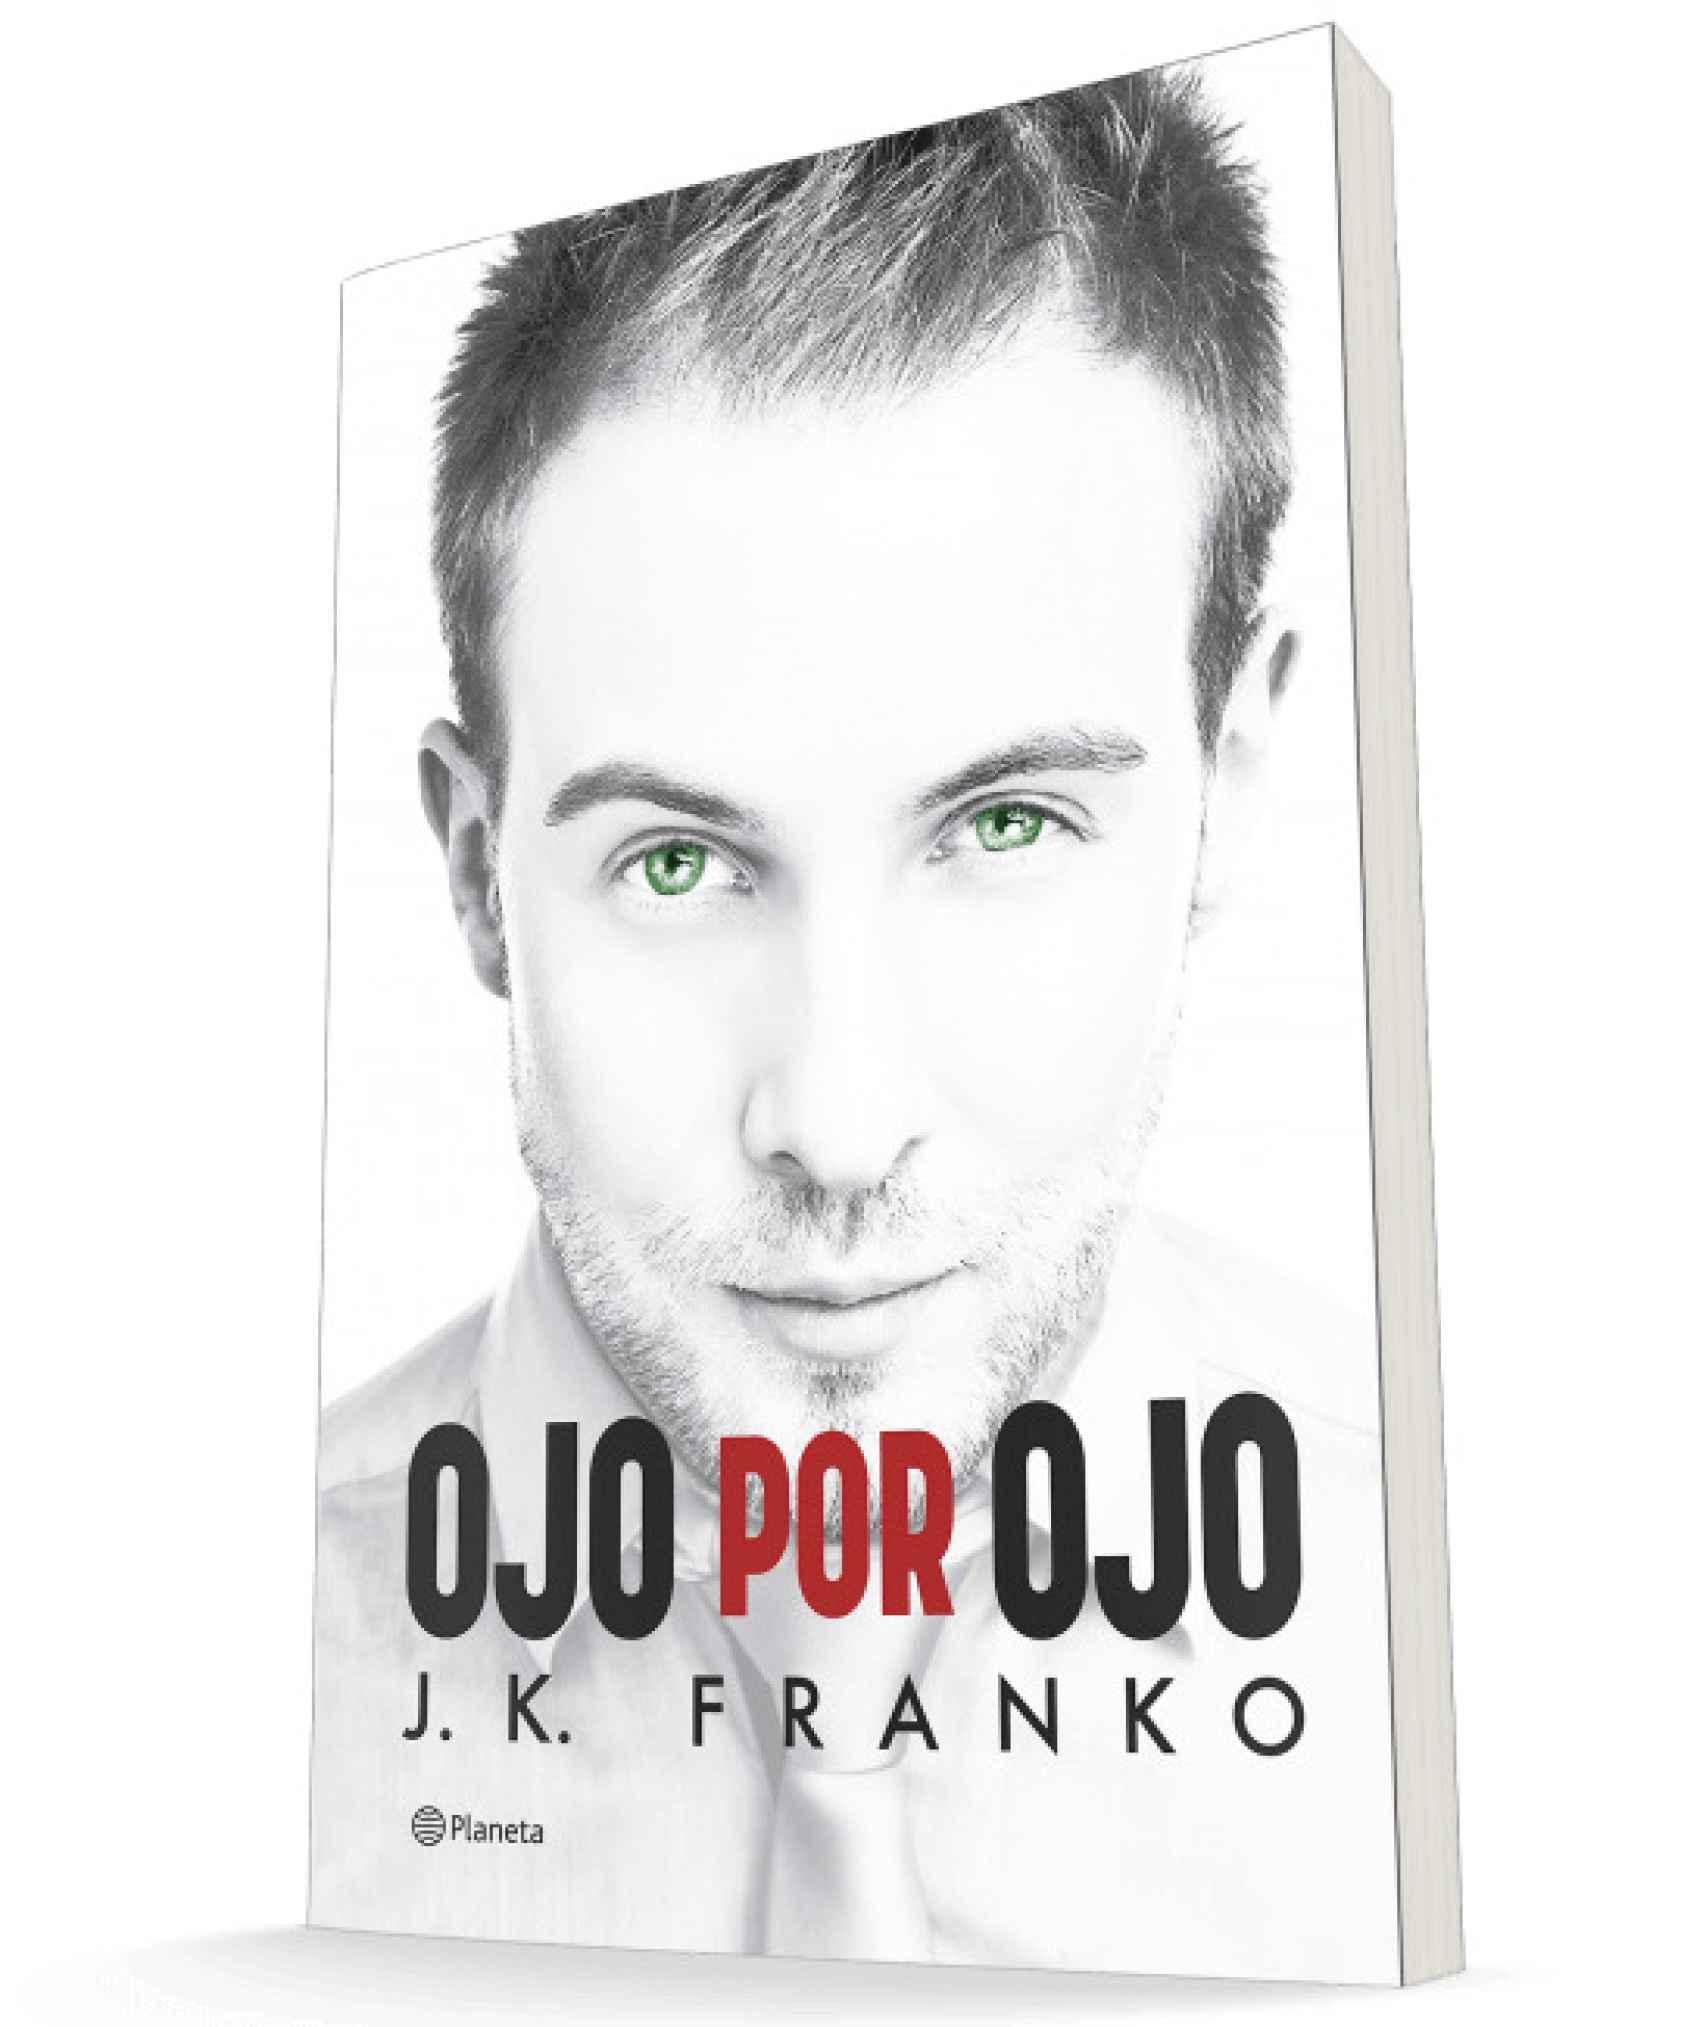 Portada de 'Ojo por ojo' de J. K. Franko.